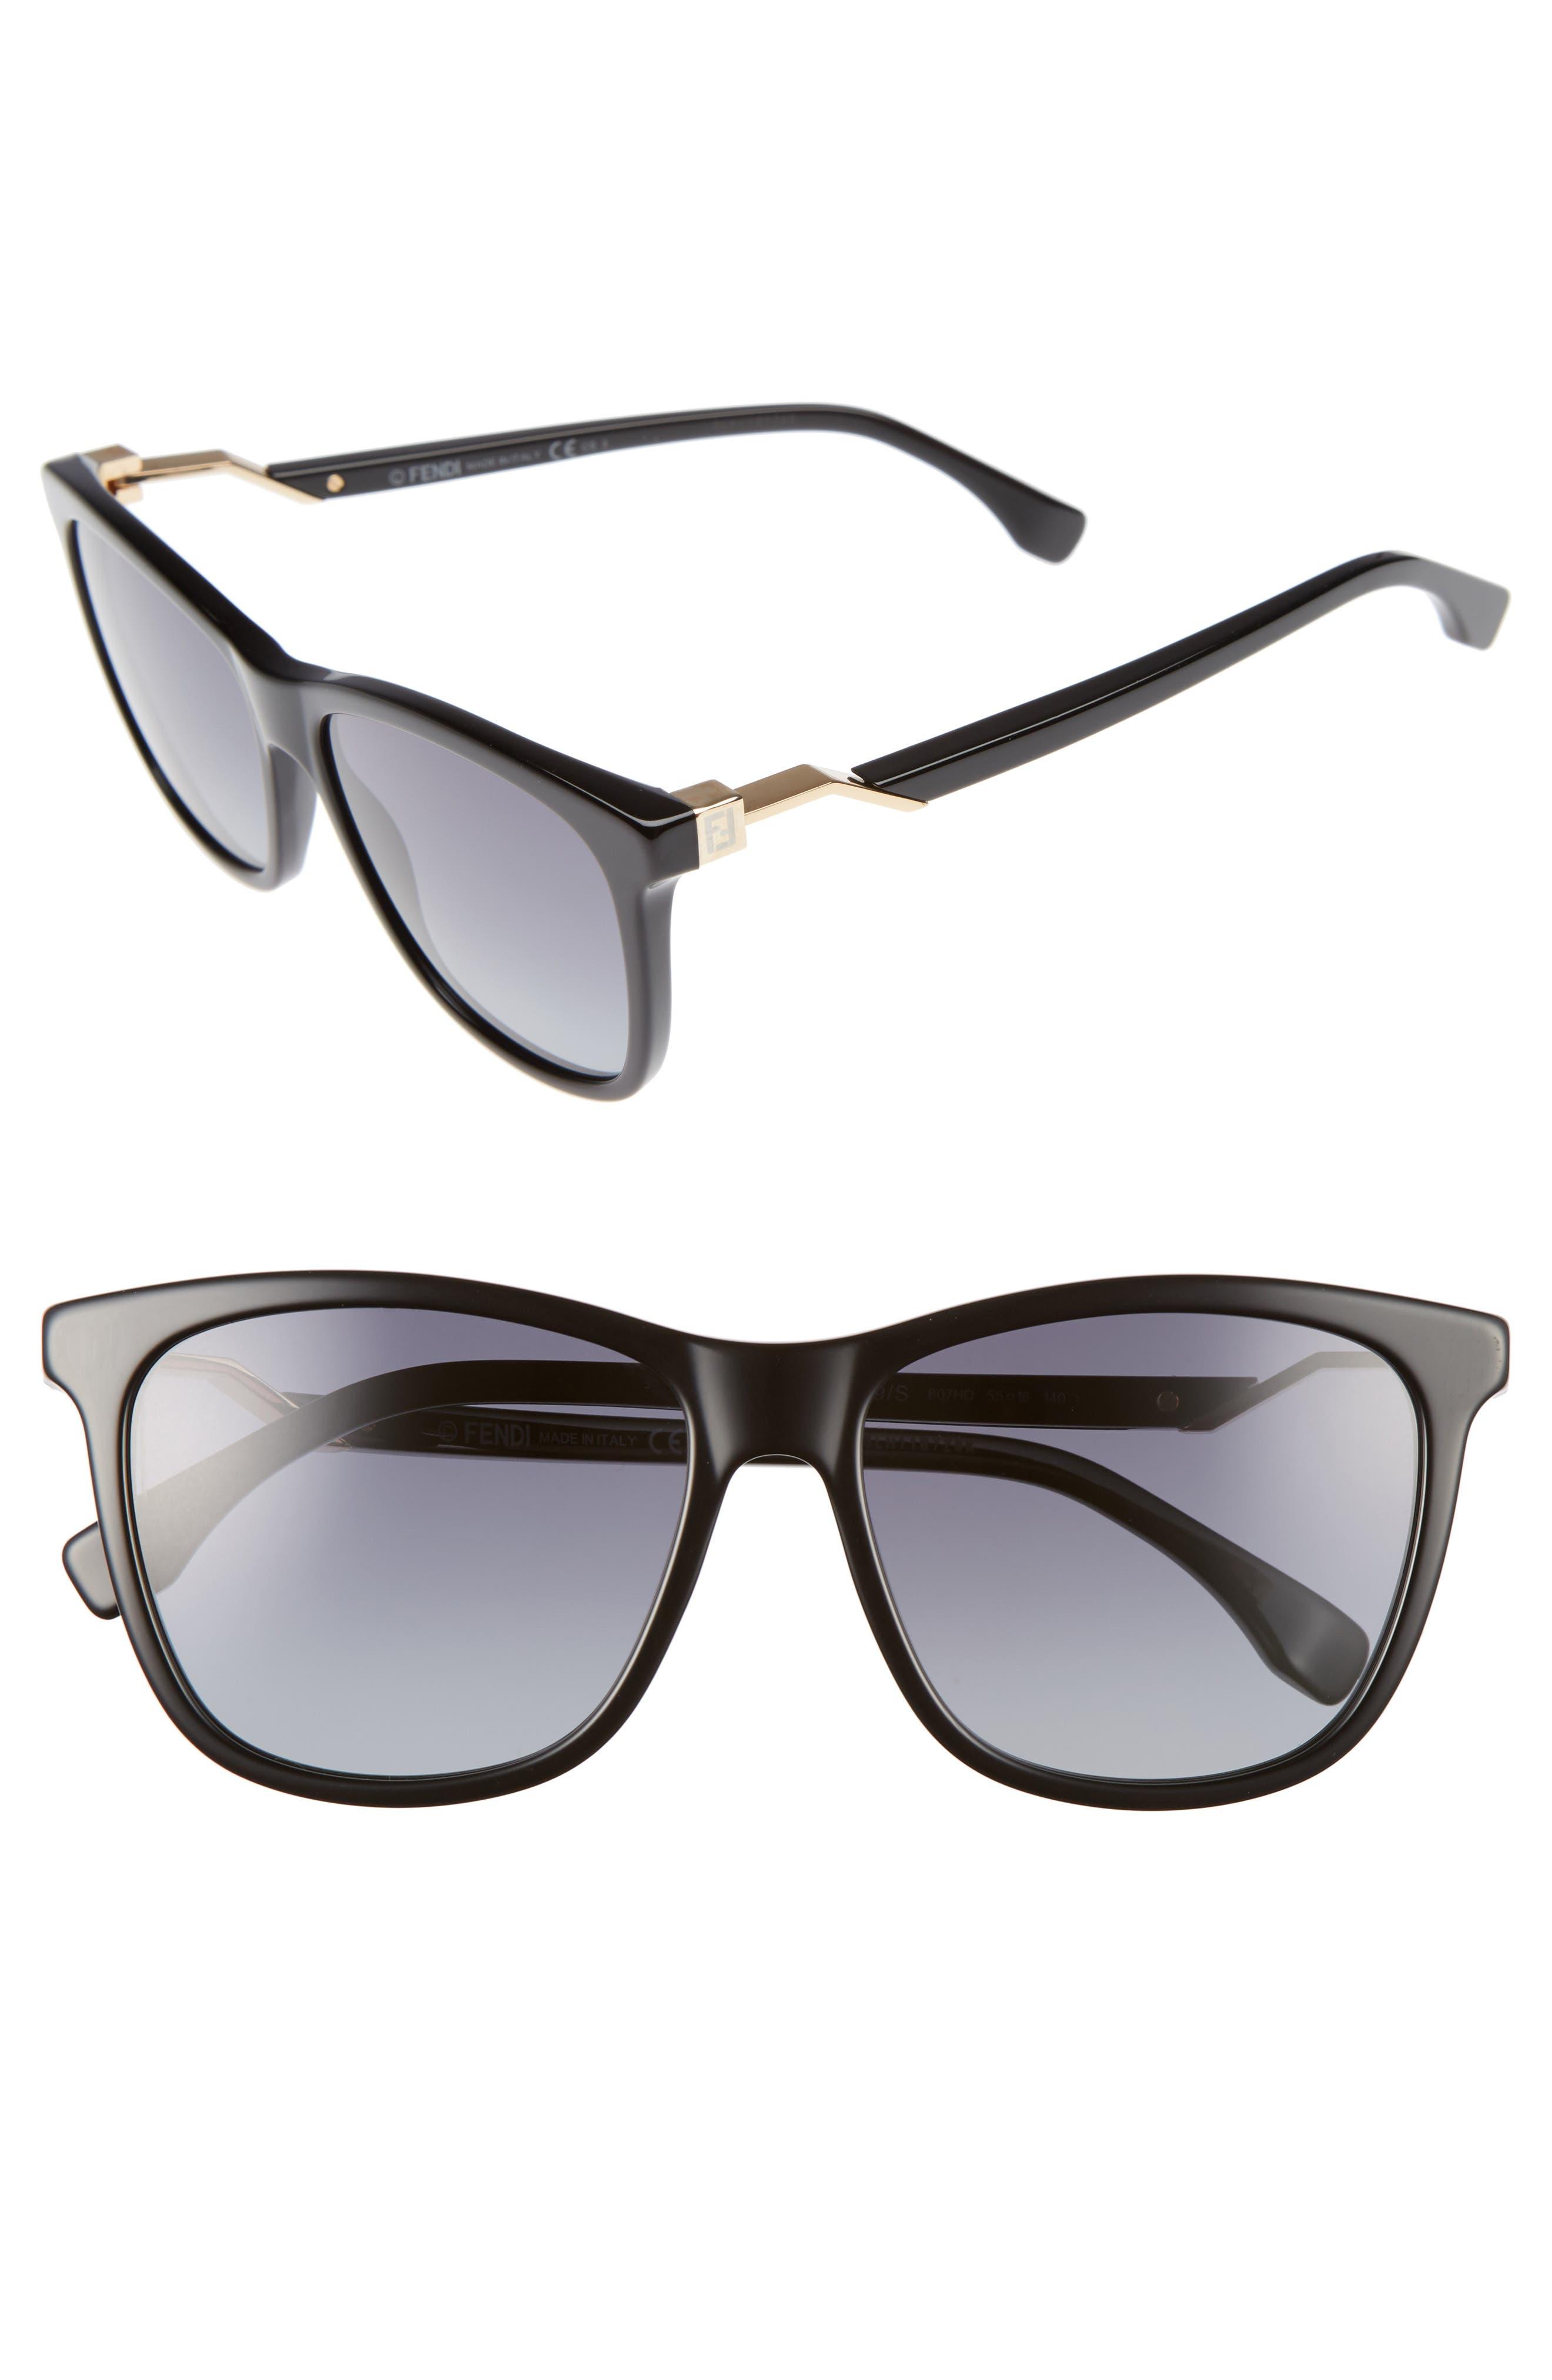 55mm Cube Retro Sunglasses,                             Alternate thumbnail 3, color,